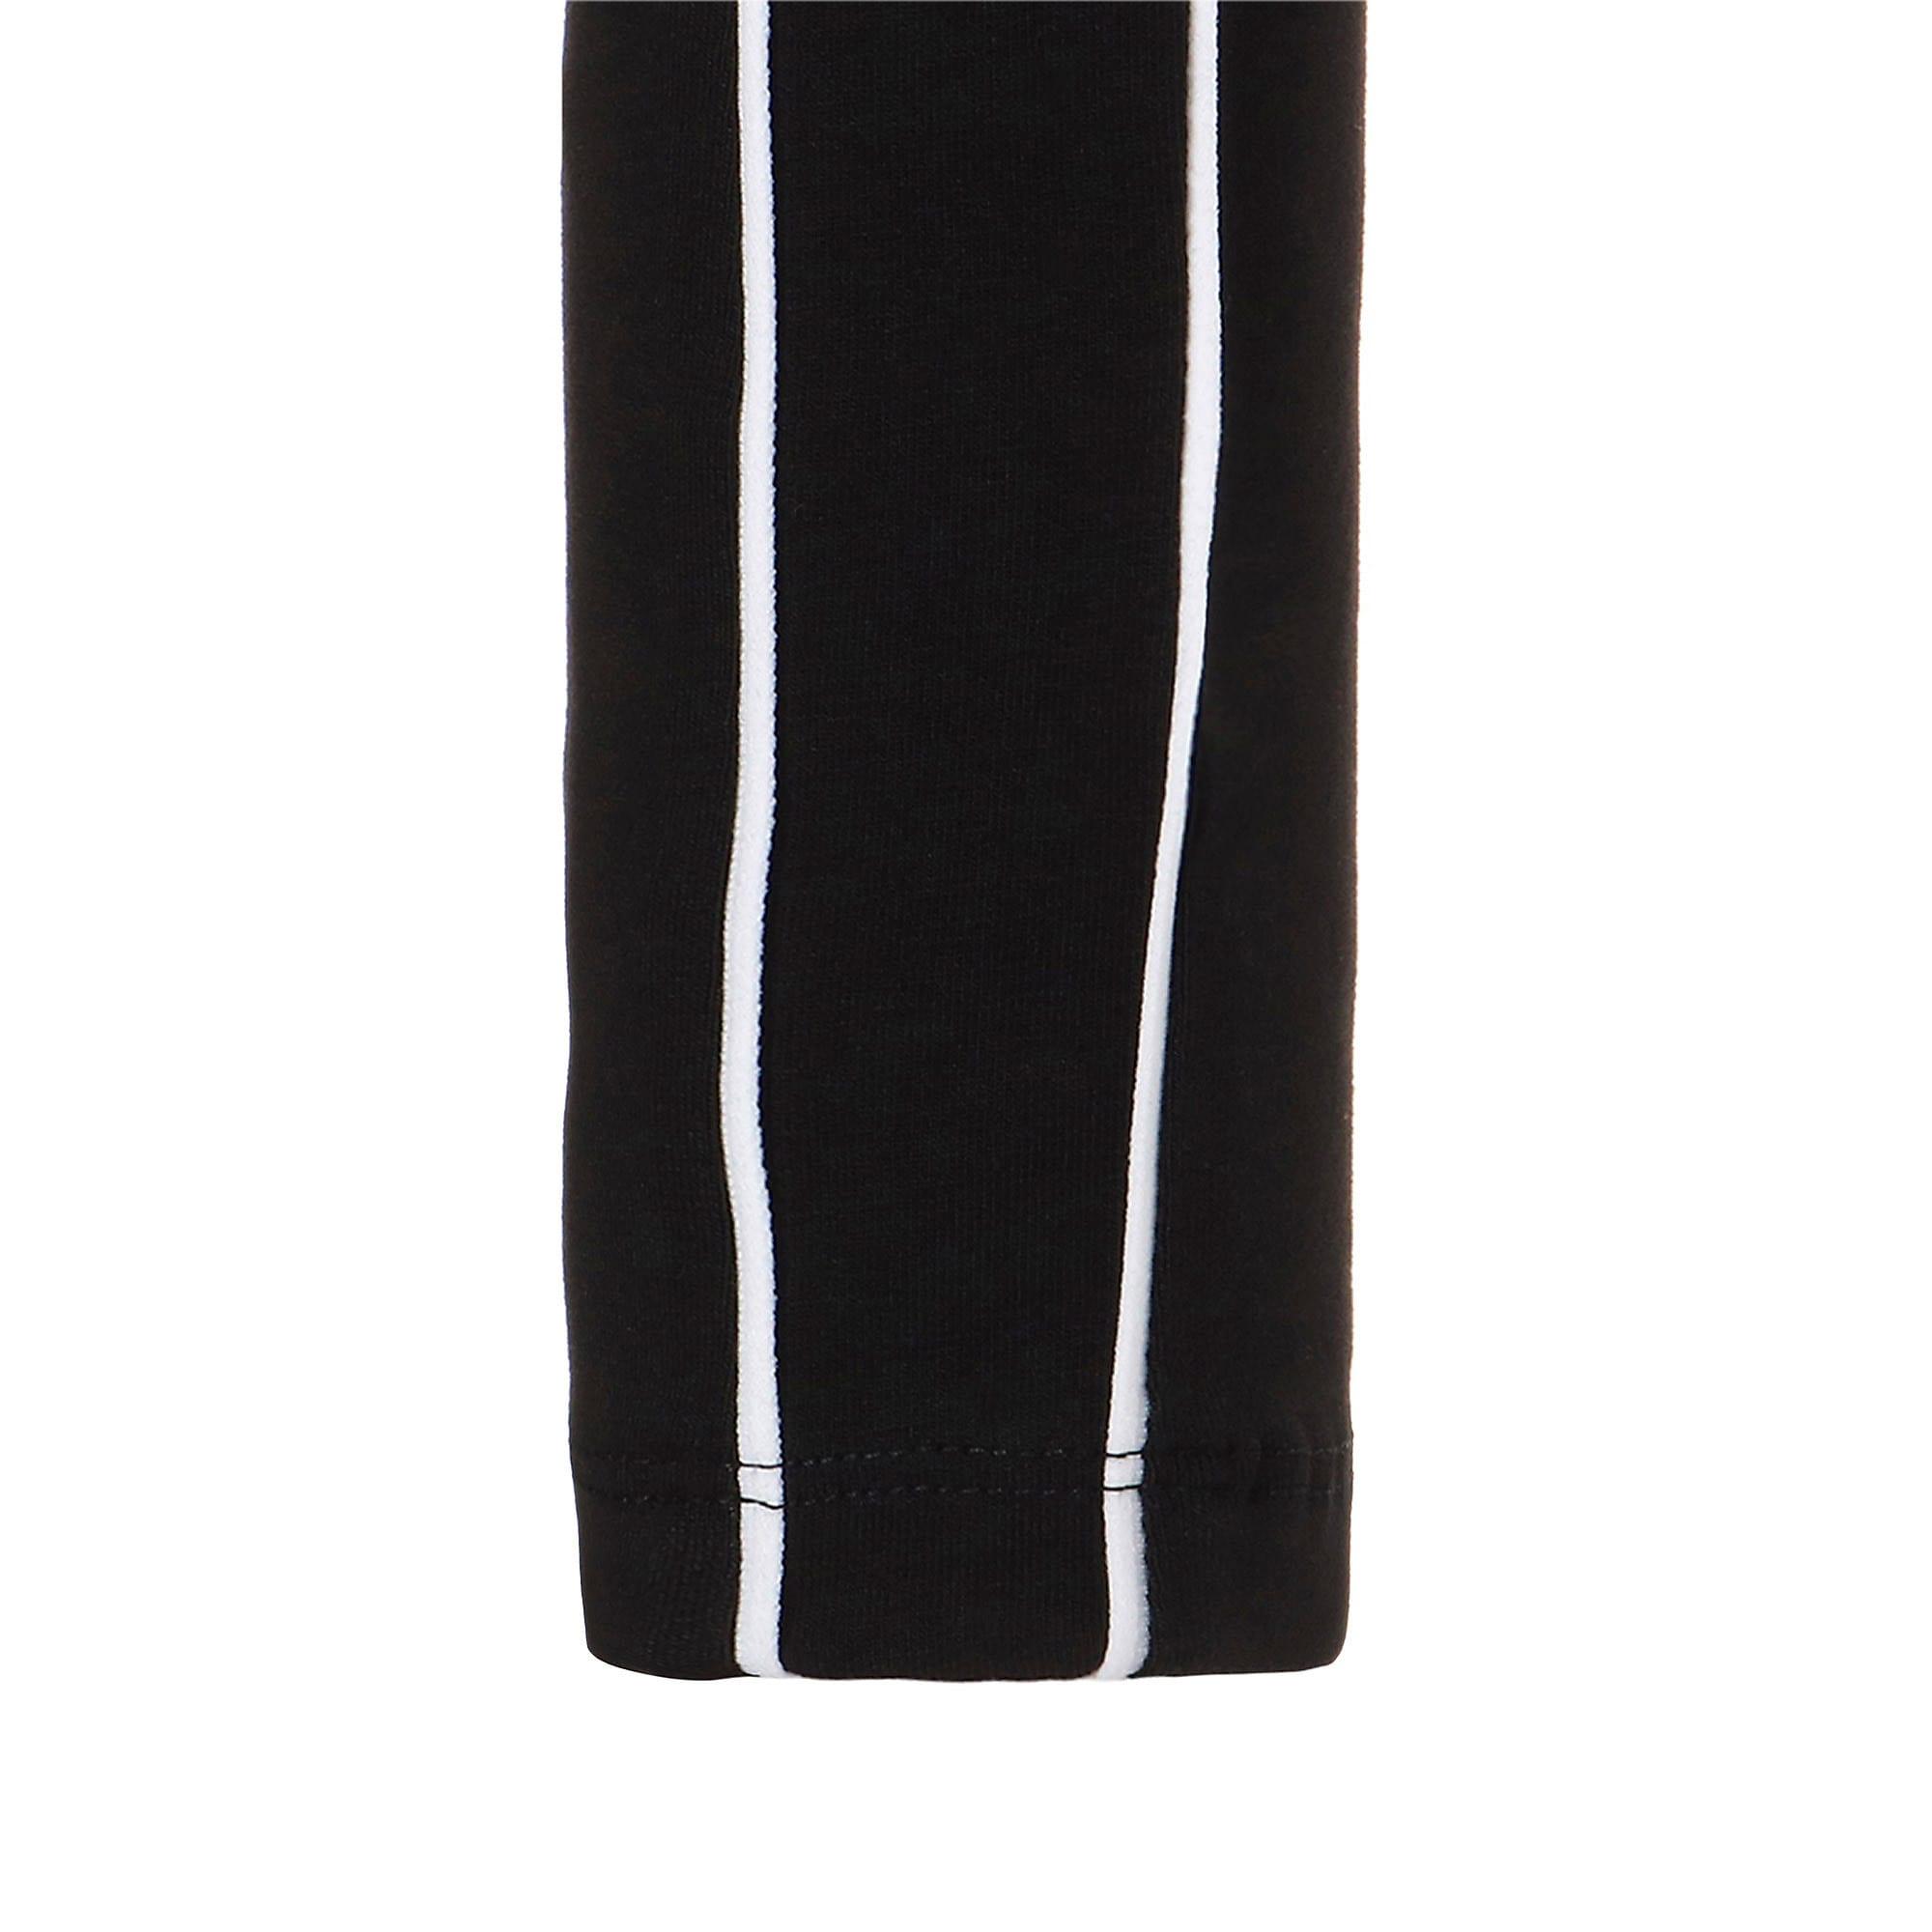 Thumbnail 8 of CLASSICS ウィメンズ ドレス, Cotton Black, medium-JPN